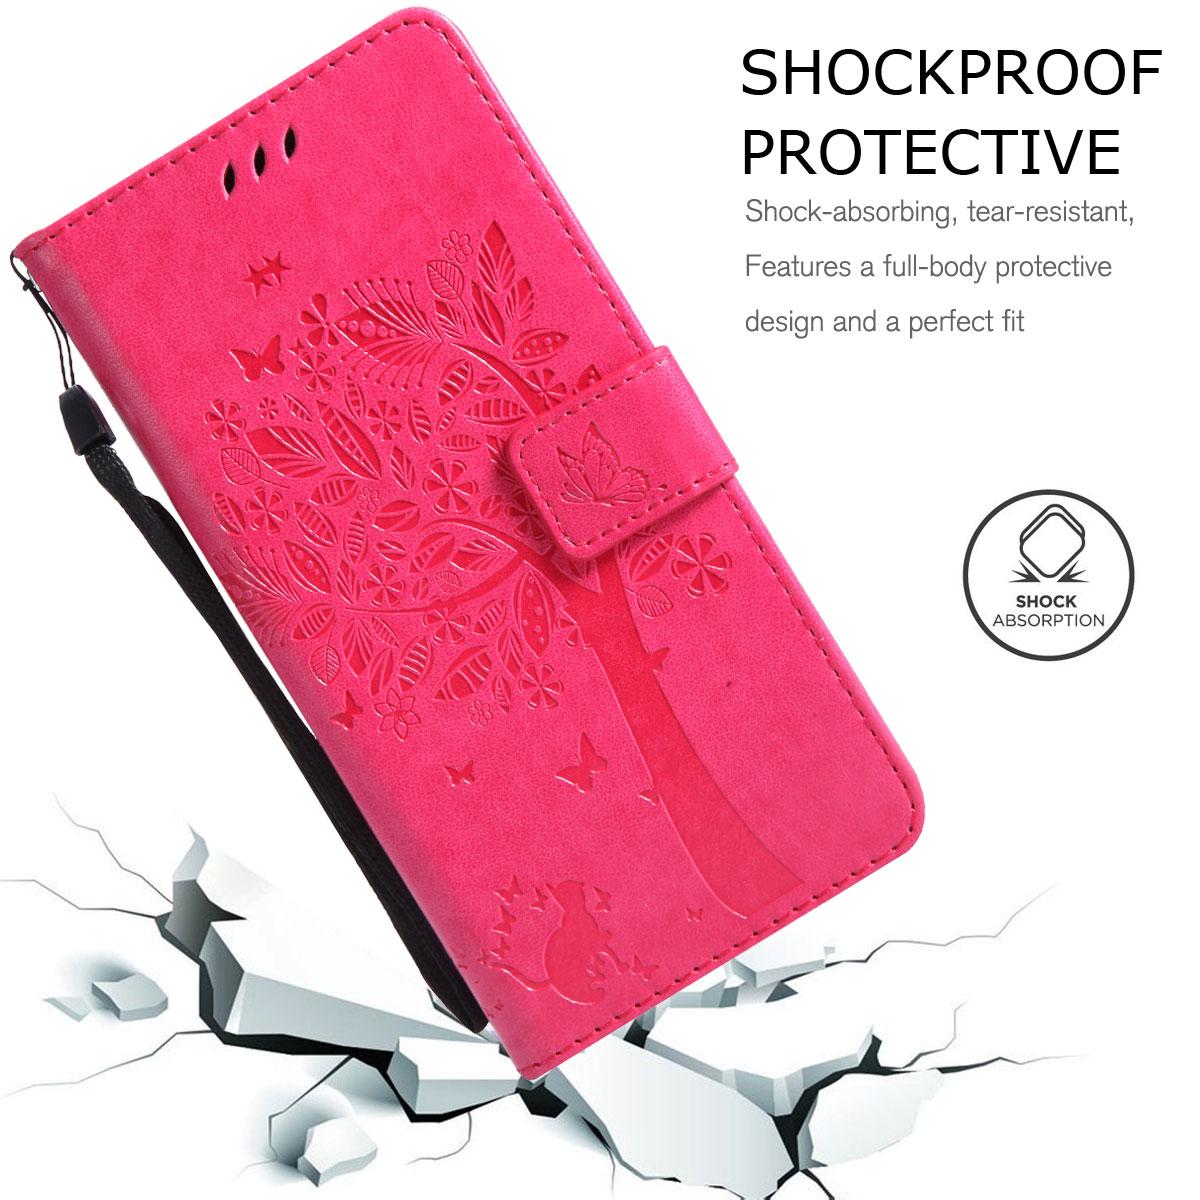 Magnetic-Leather-Credit-Card-Holder-Flip-Case-Cover-For-Google-Pixel-2-2-XL thumbnail 46